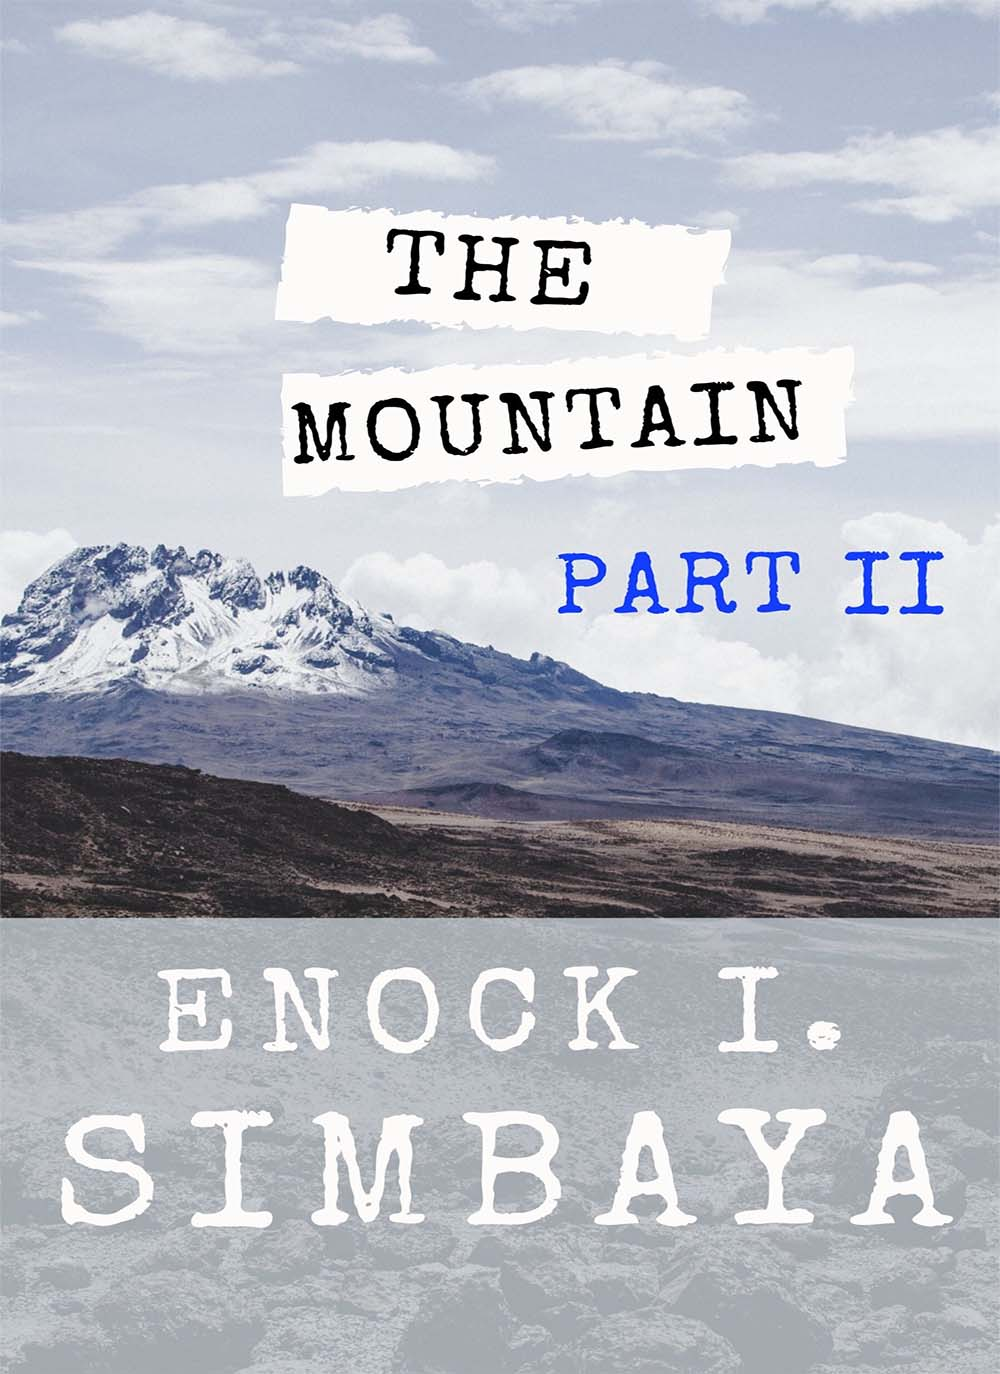 The Mountain (Part II)